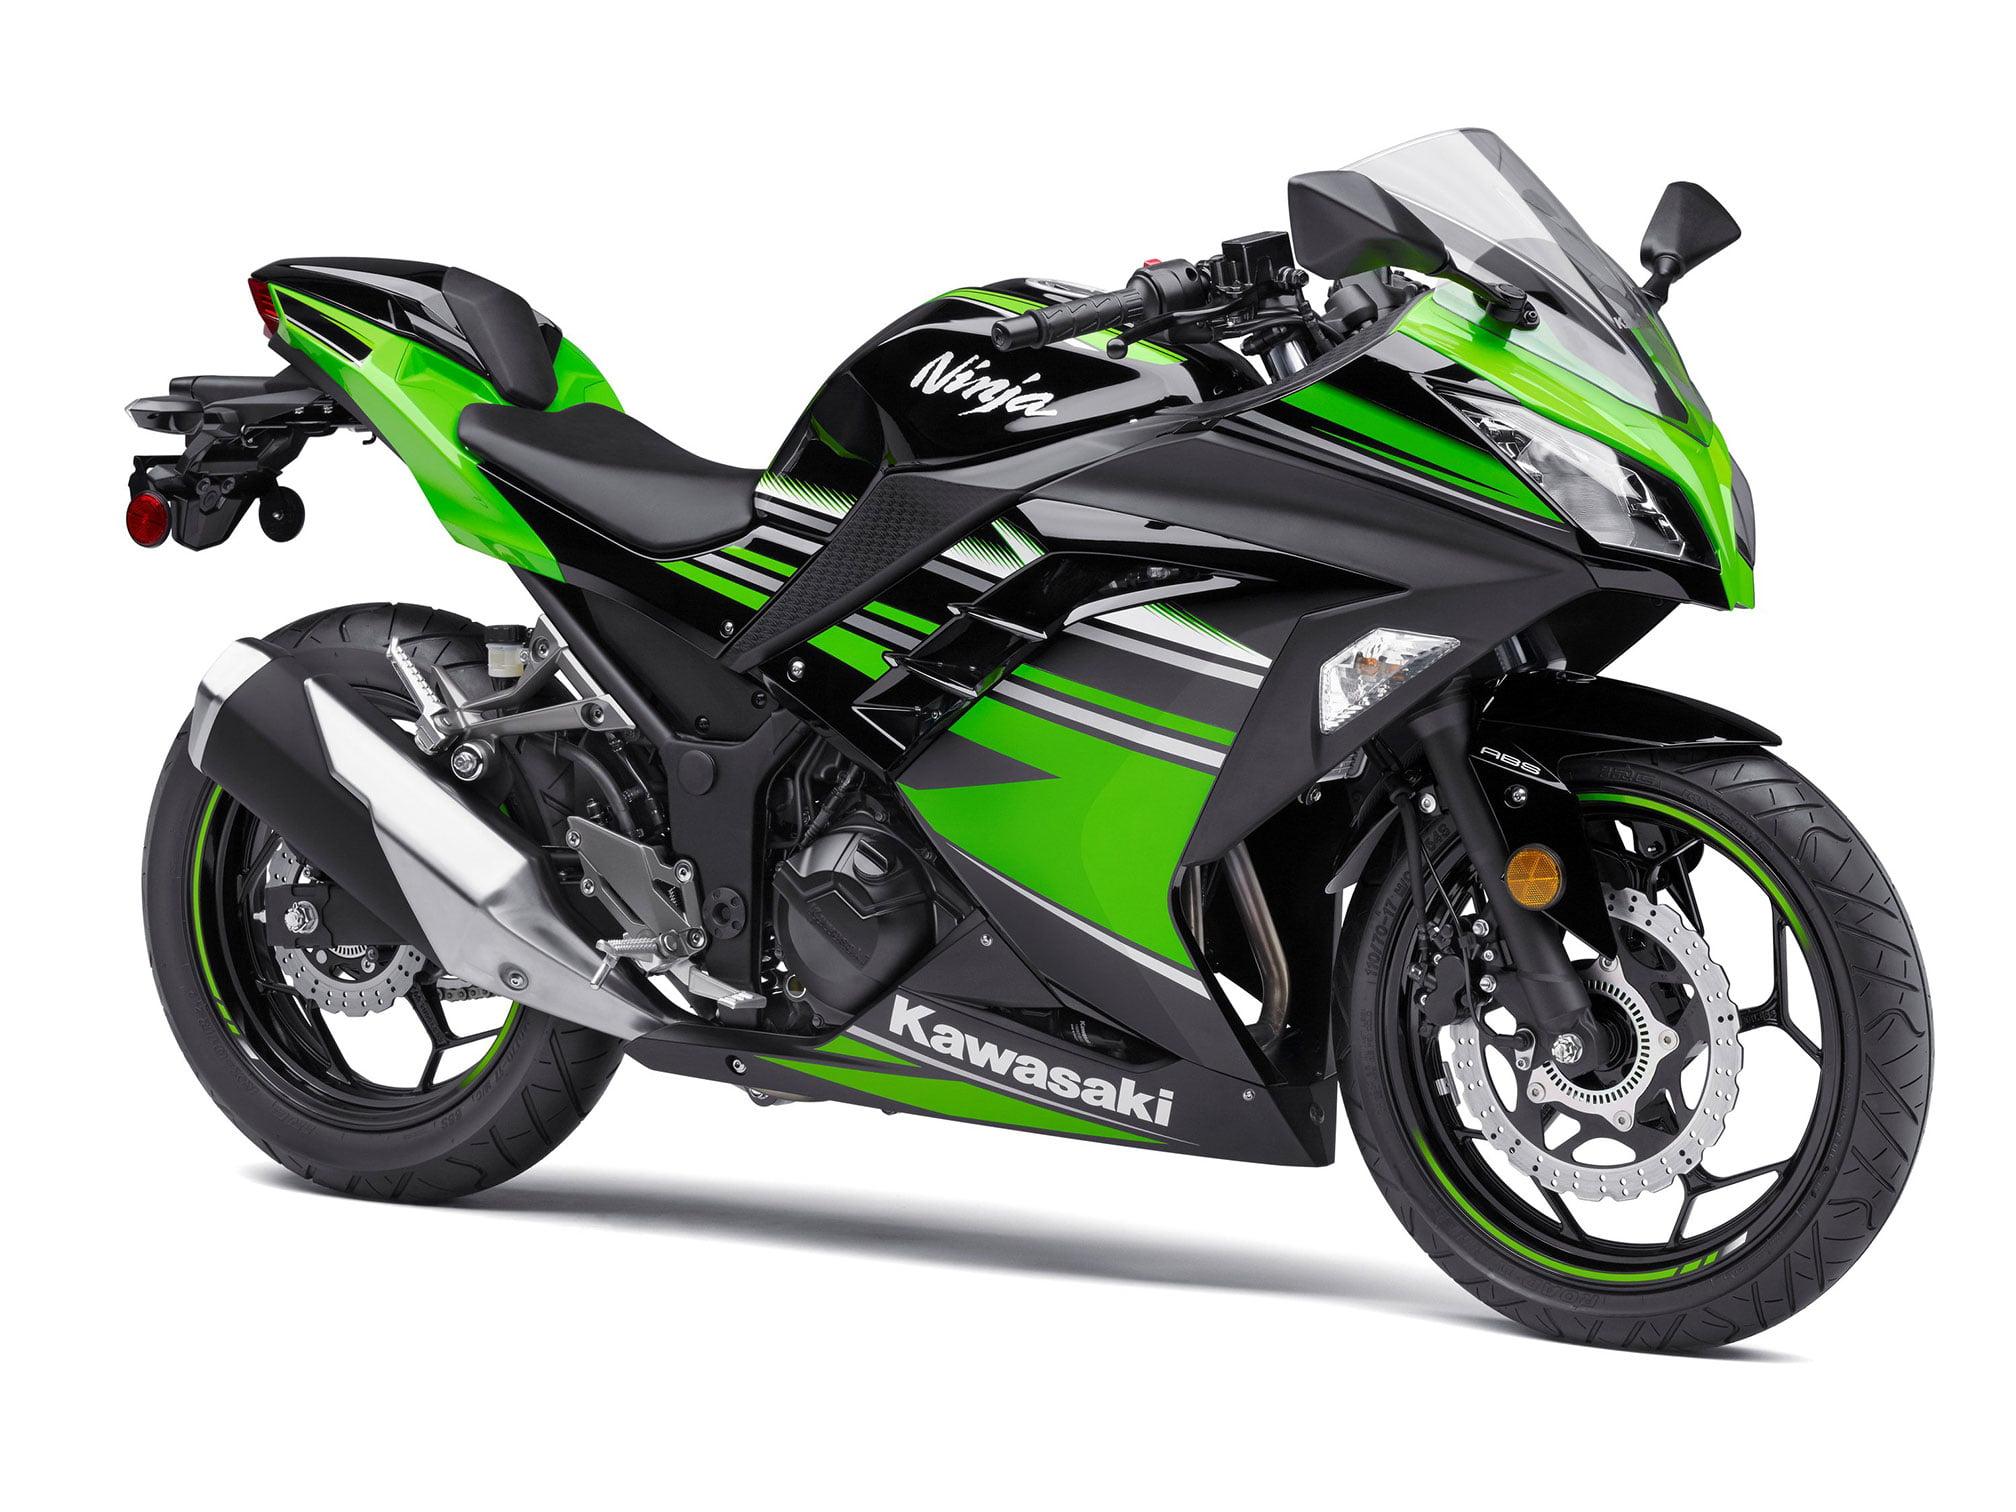 Kawasaki Ninja Zxr Cost